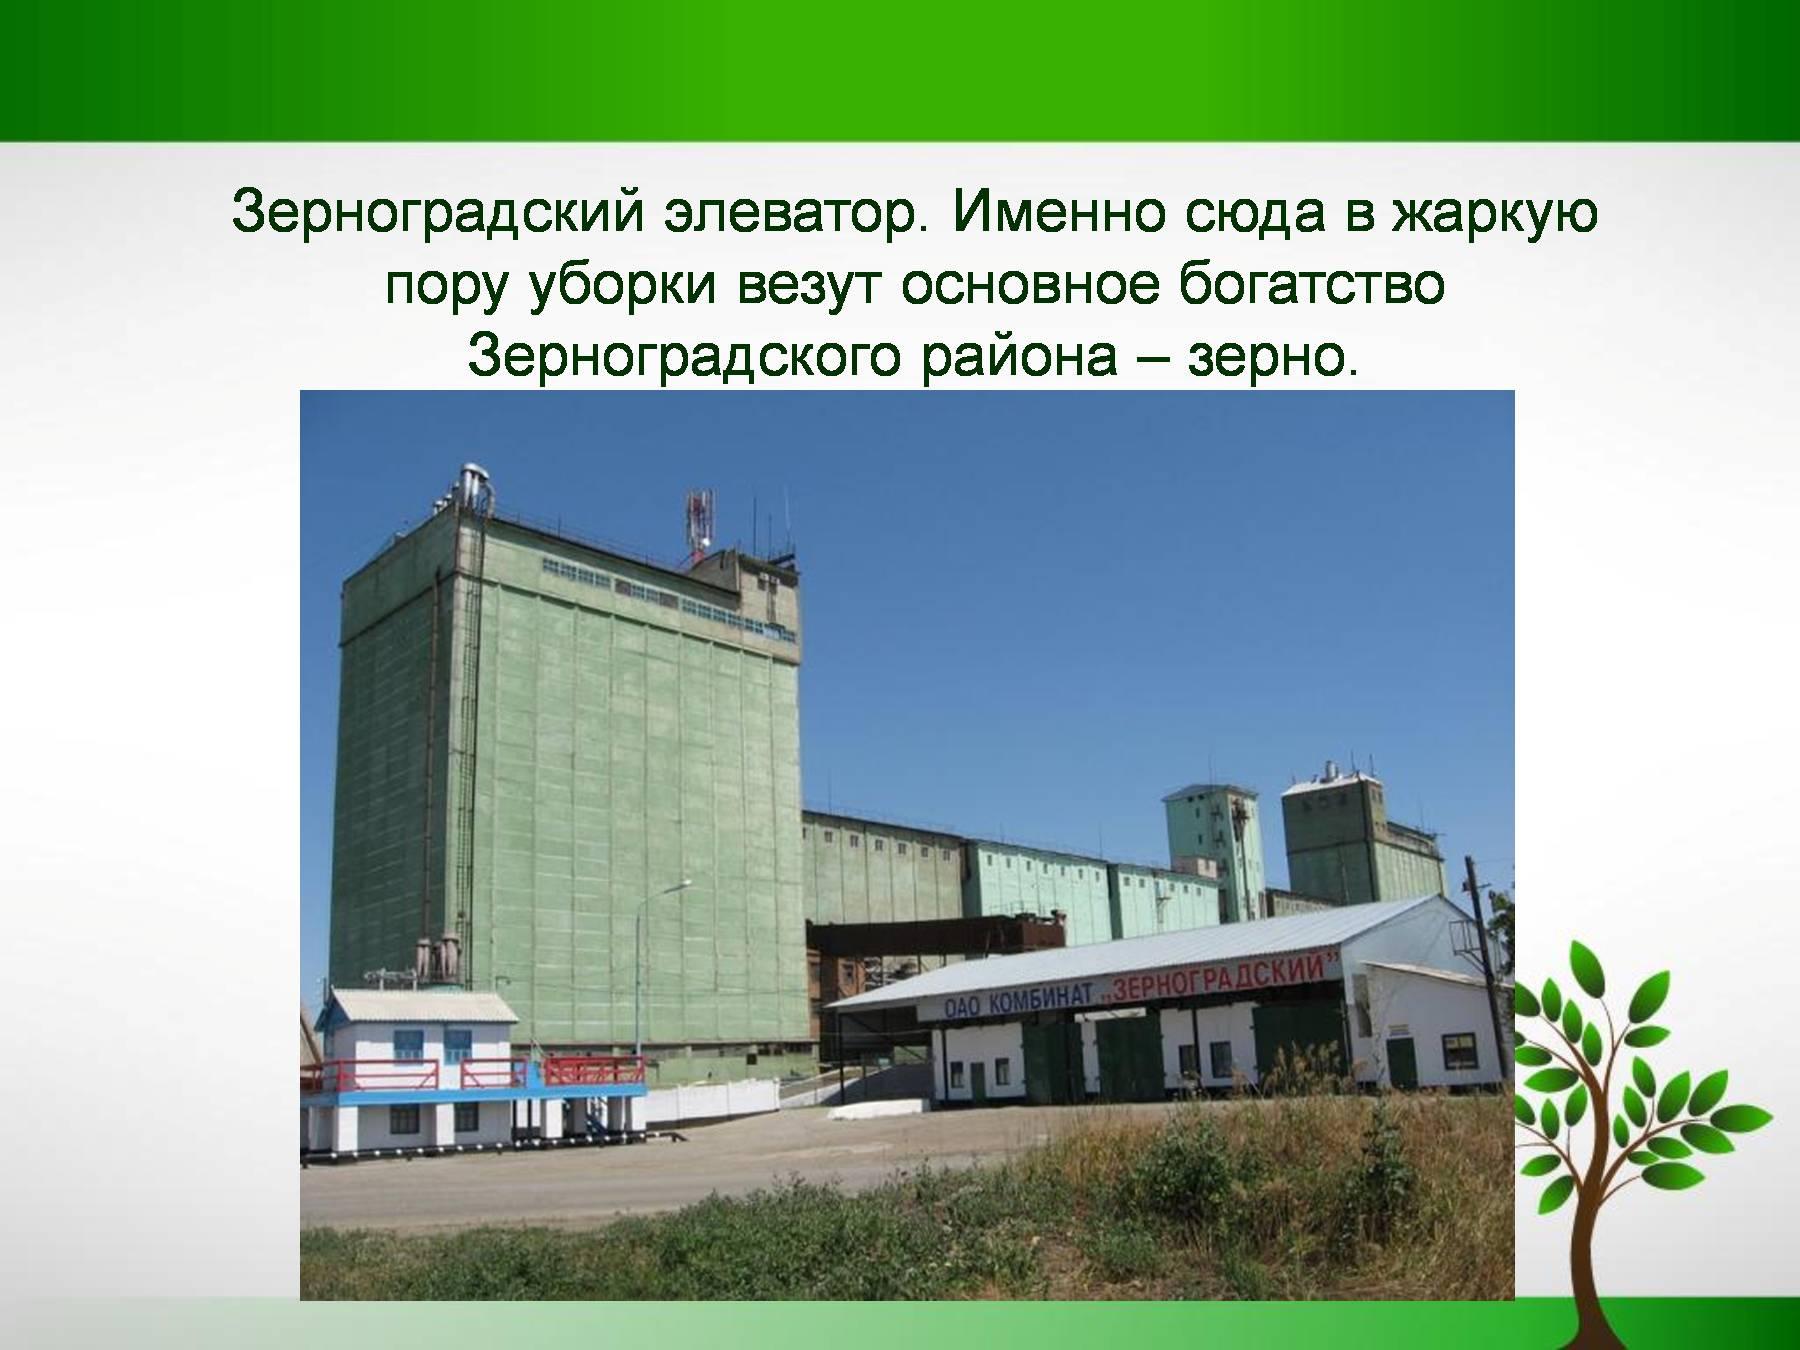 Комбинат зерноградский элеватор лента транспортера в орле